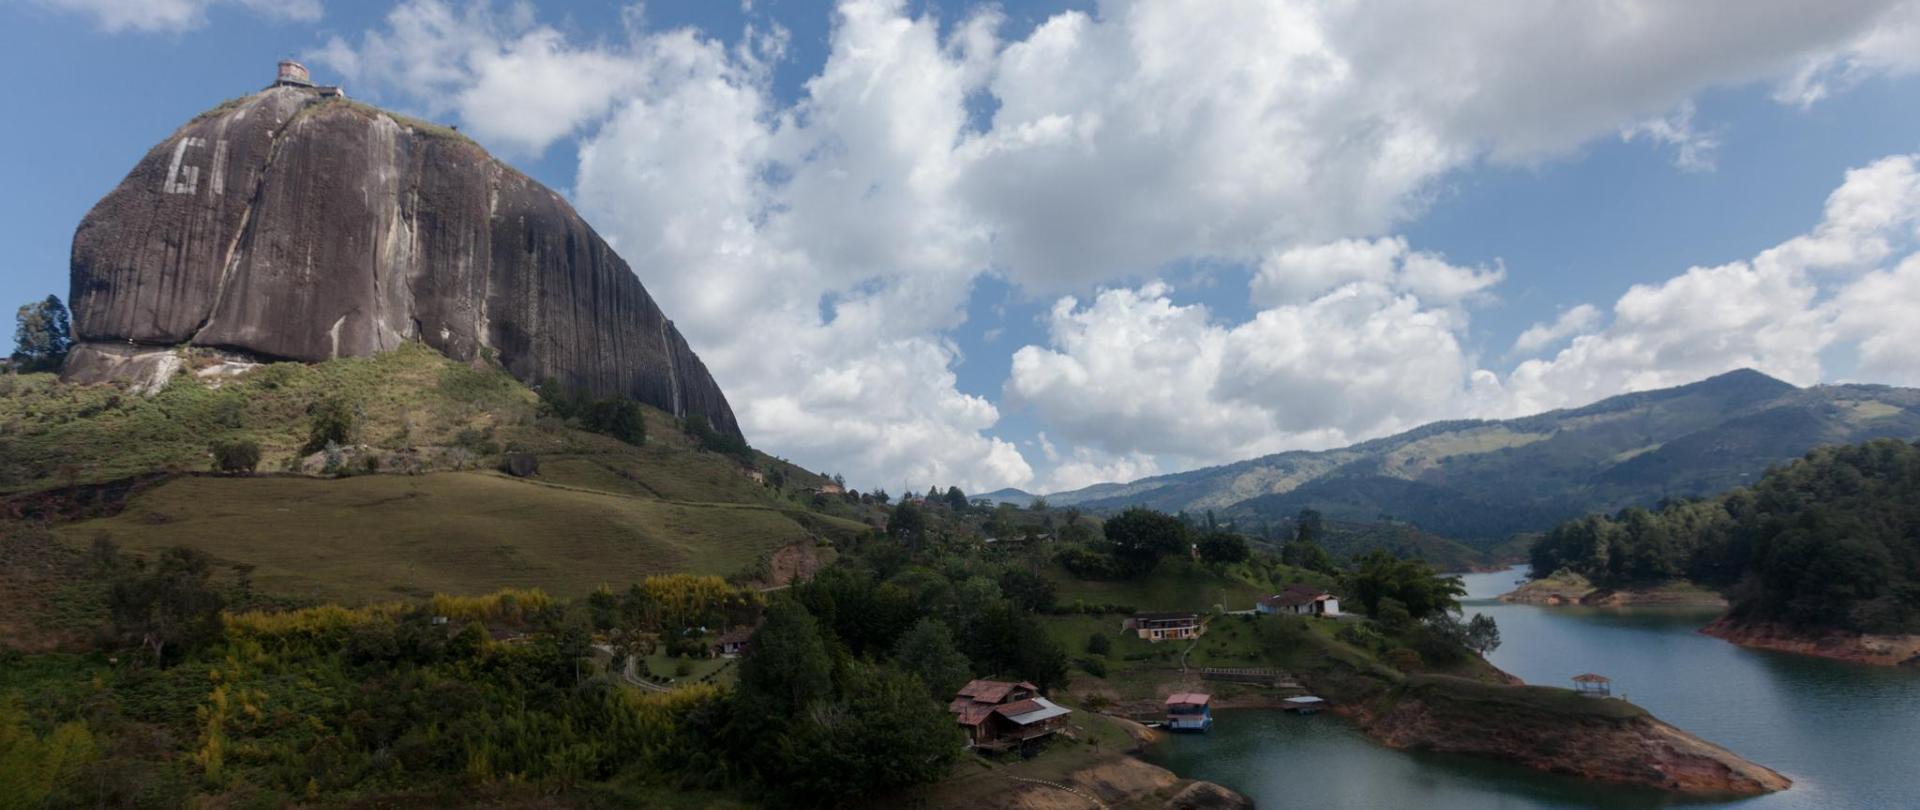 Galería Guatape Vista  -31.jpg